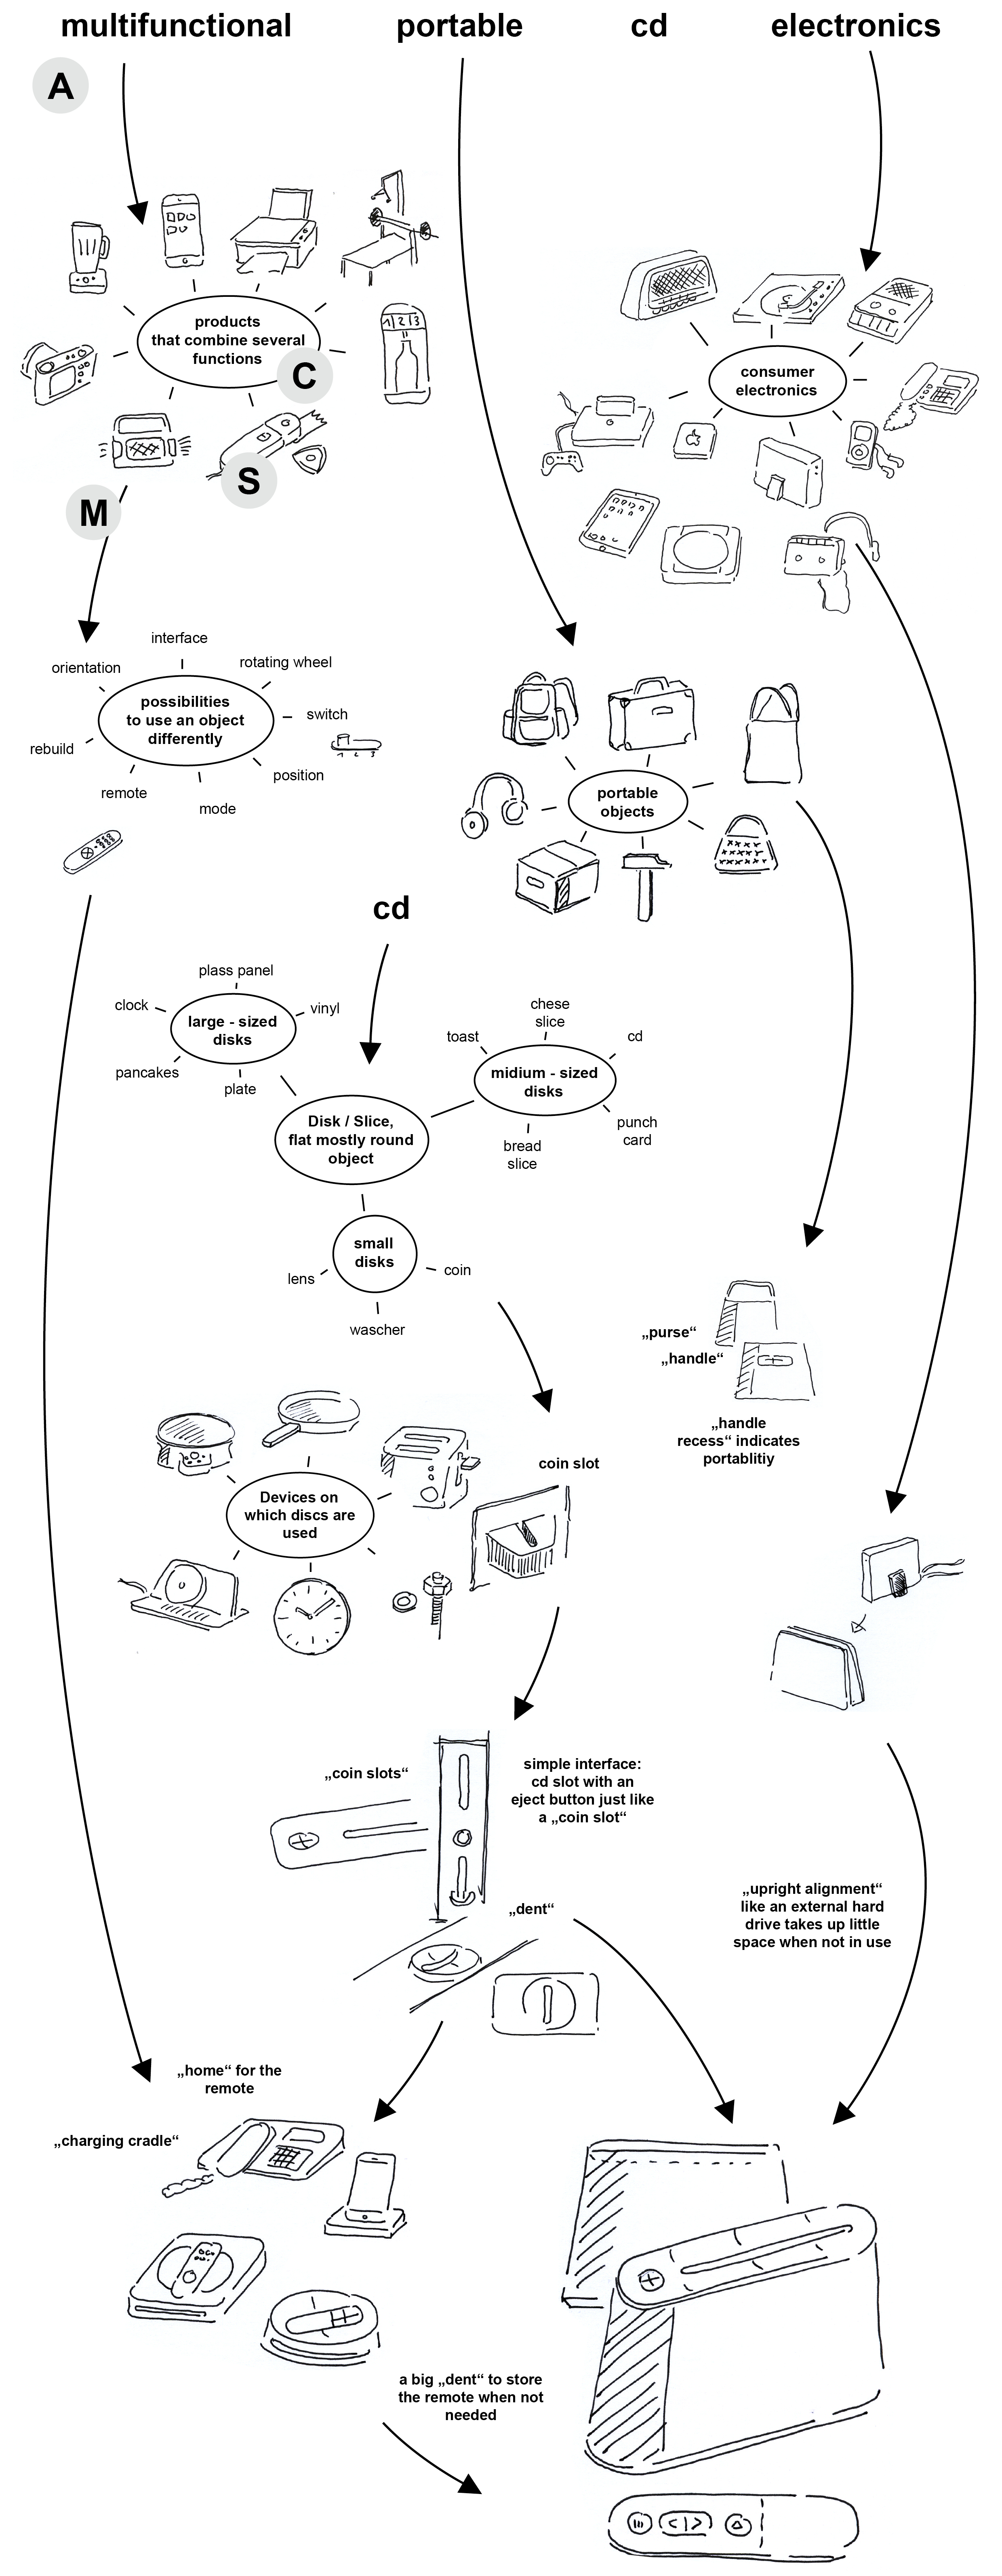 Analogy-Process-CD-Player-Johannes-Steinbauer.jpg